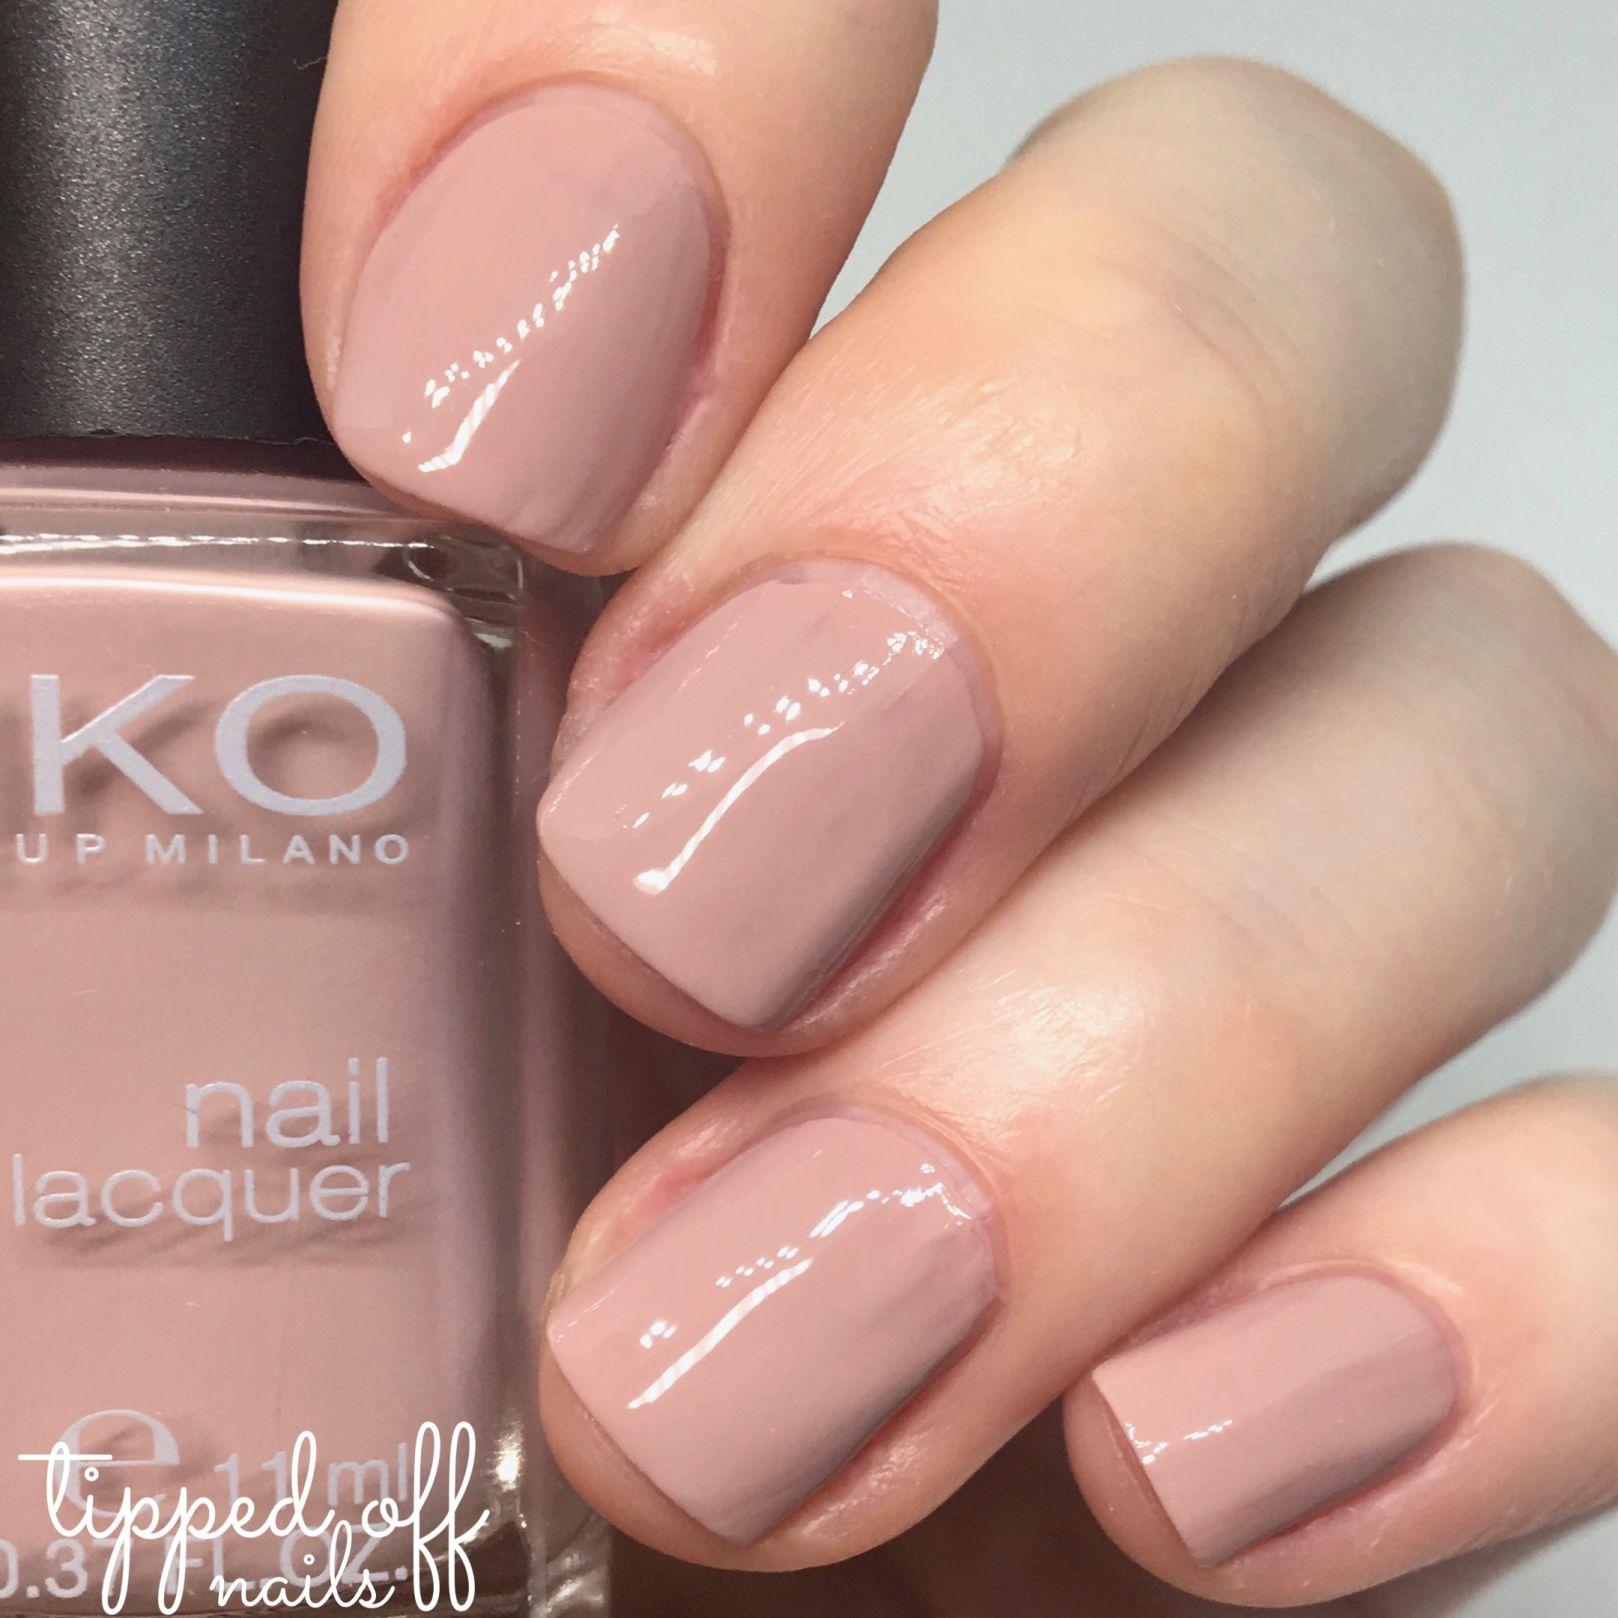 Kiko milano nail lacquer swatch 508 rose sand makeup for Kiko 365 tattoo rose